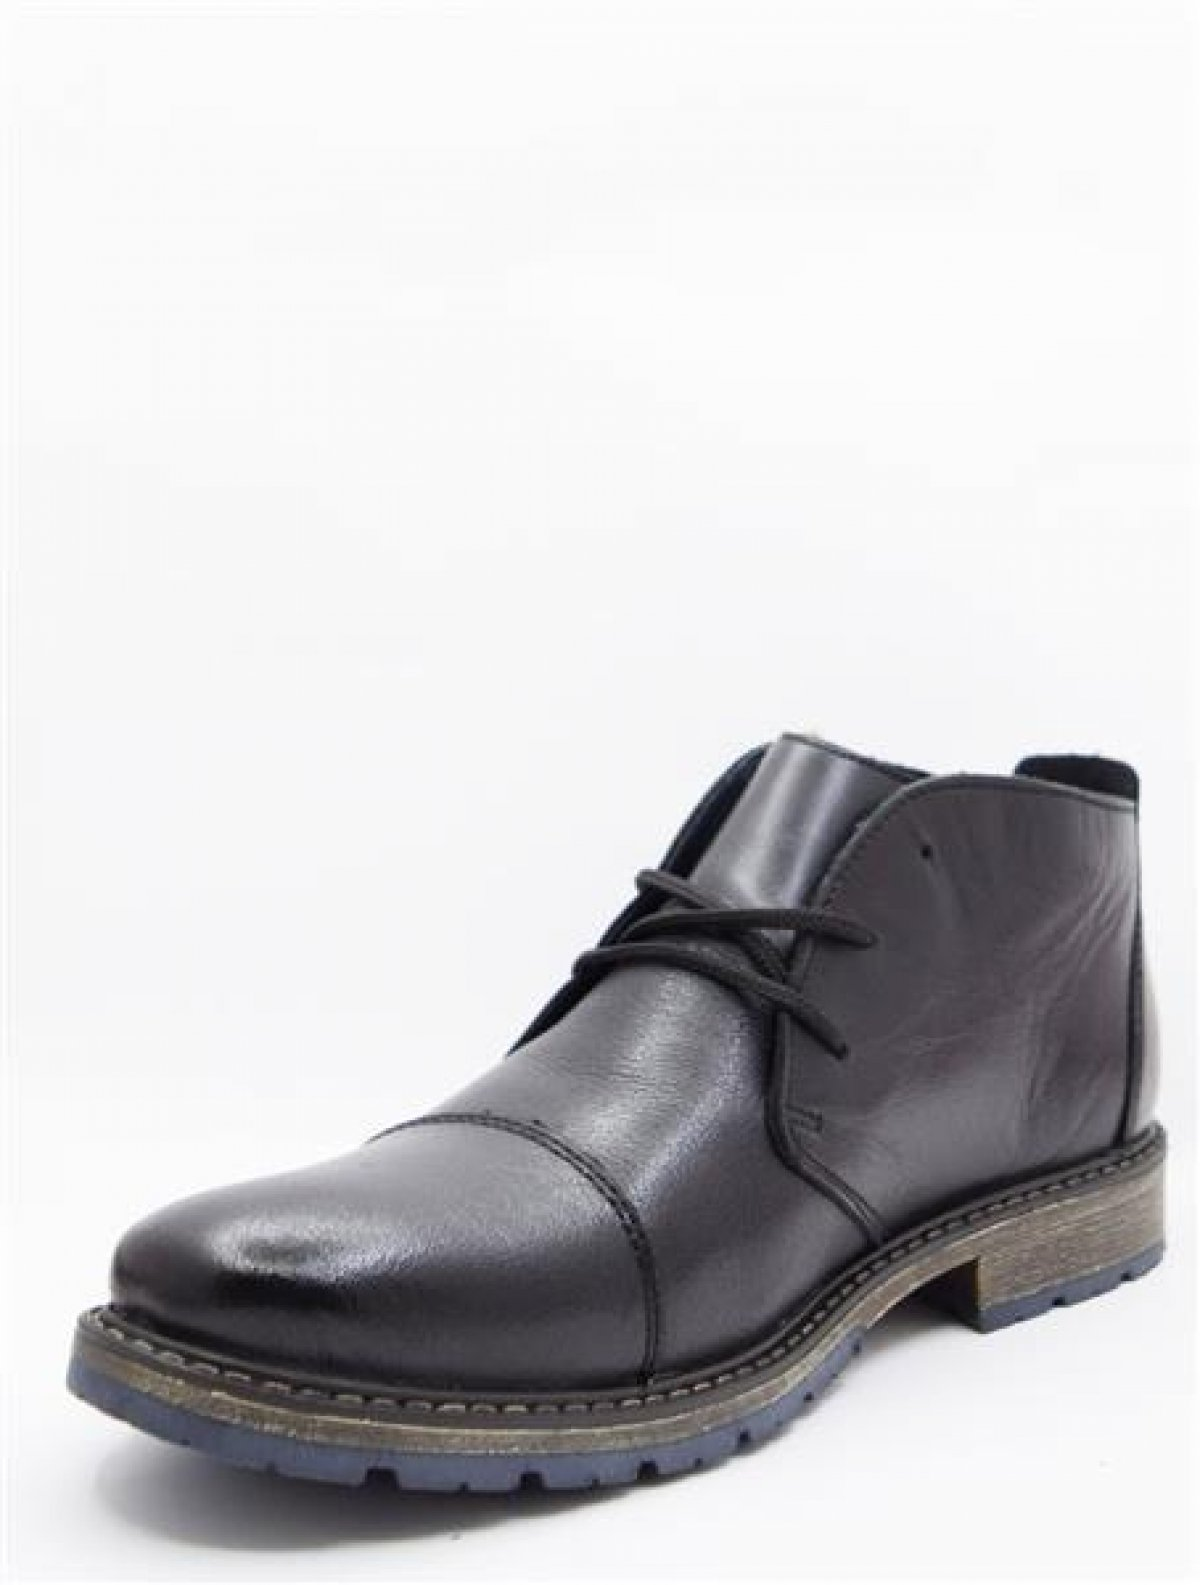 38122-00 ботинки мужские